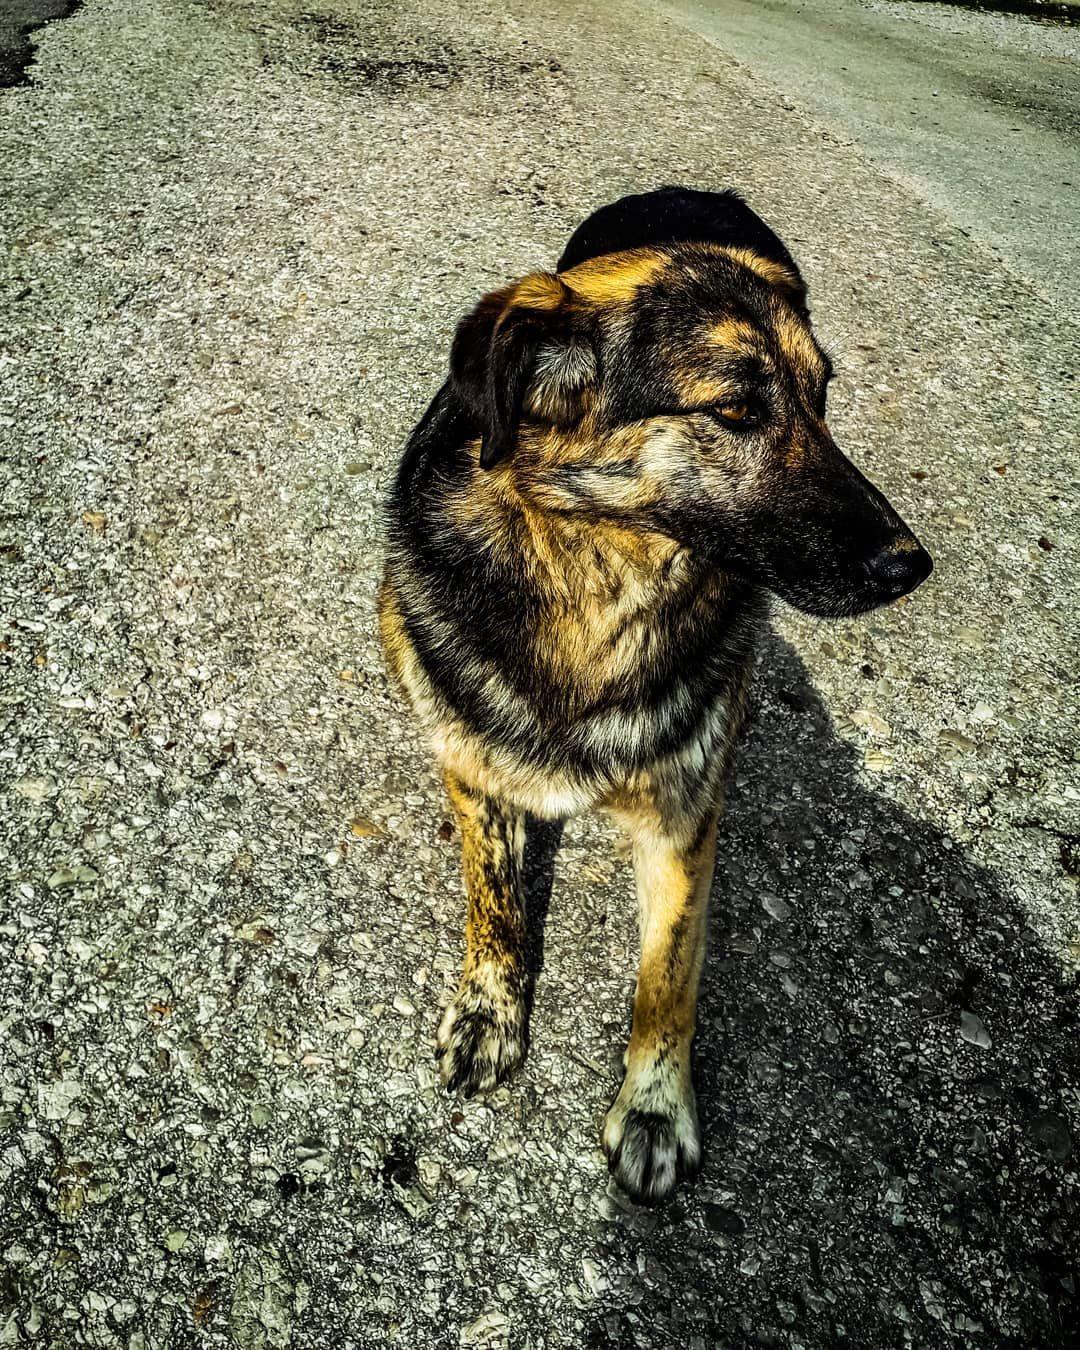 #morningwalk#monday#nowork#naturewalks#naturephotography#animalshots#animals_captures#dogstagram#dogs#dogslife#doglifestyle#streetdog#nicedog#lovedogs#betterthanpeople#